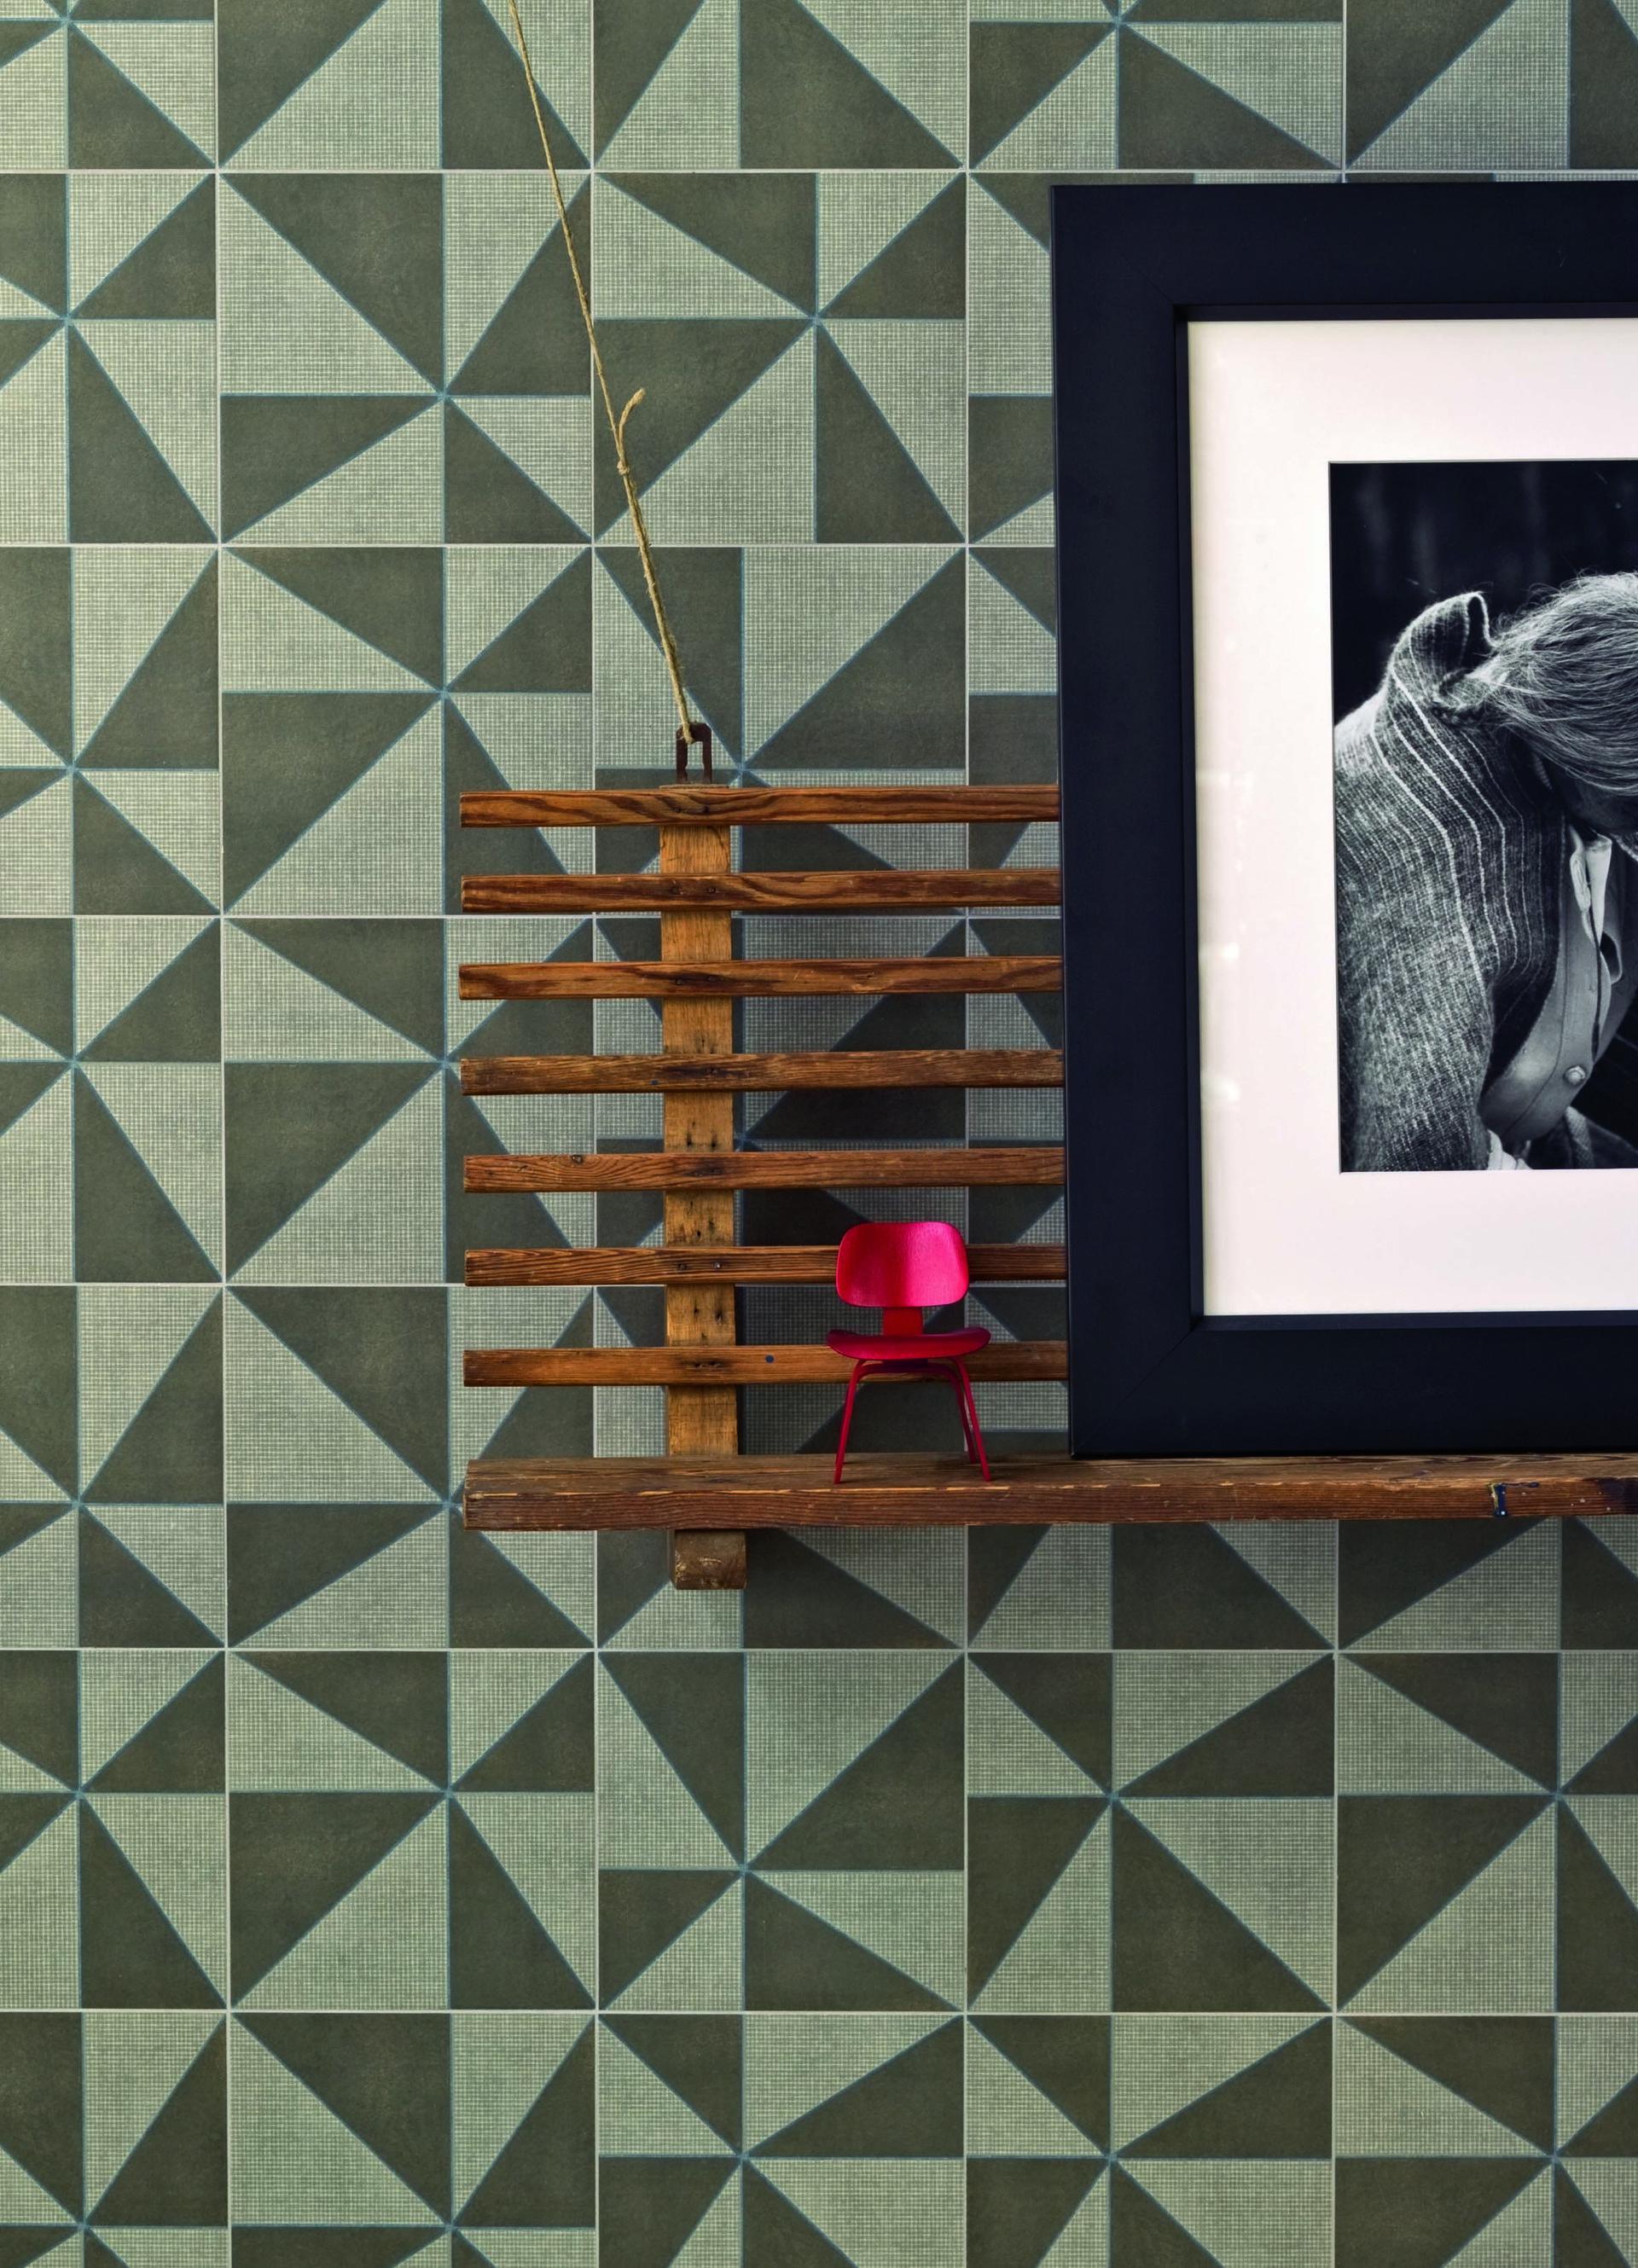 azulej de mutina tile expert fournisseur de carrelage italien et espagnol italien photo. Black Bedroom Furniture Sets. Home Design Ideas